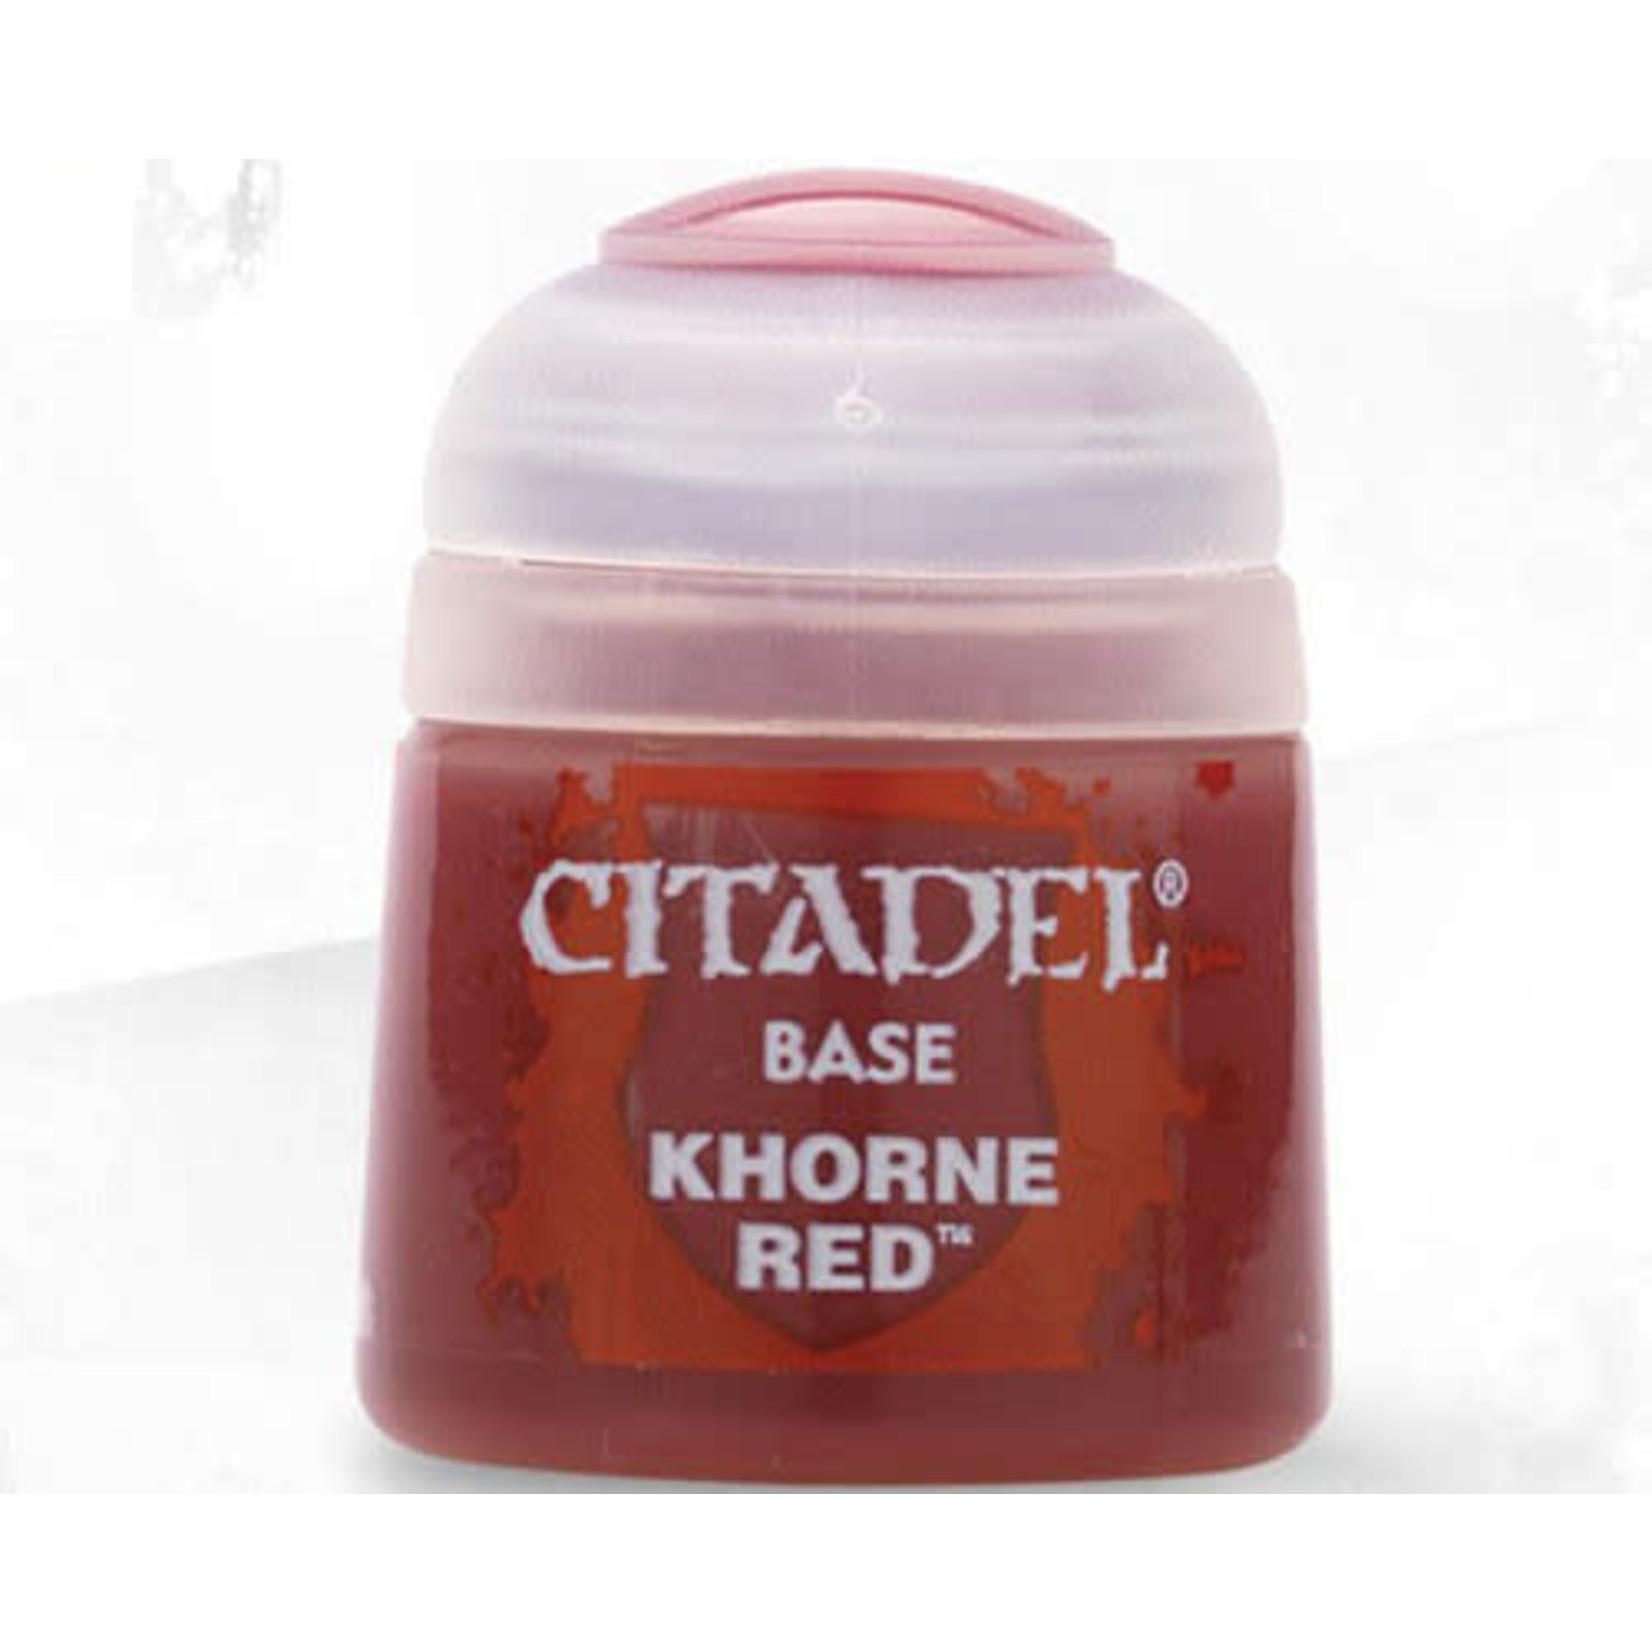 Citadel Citadel Paint - Base: Khorne Red